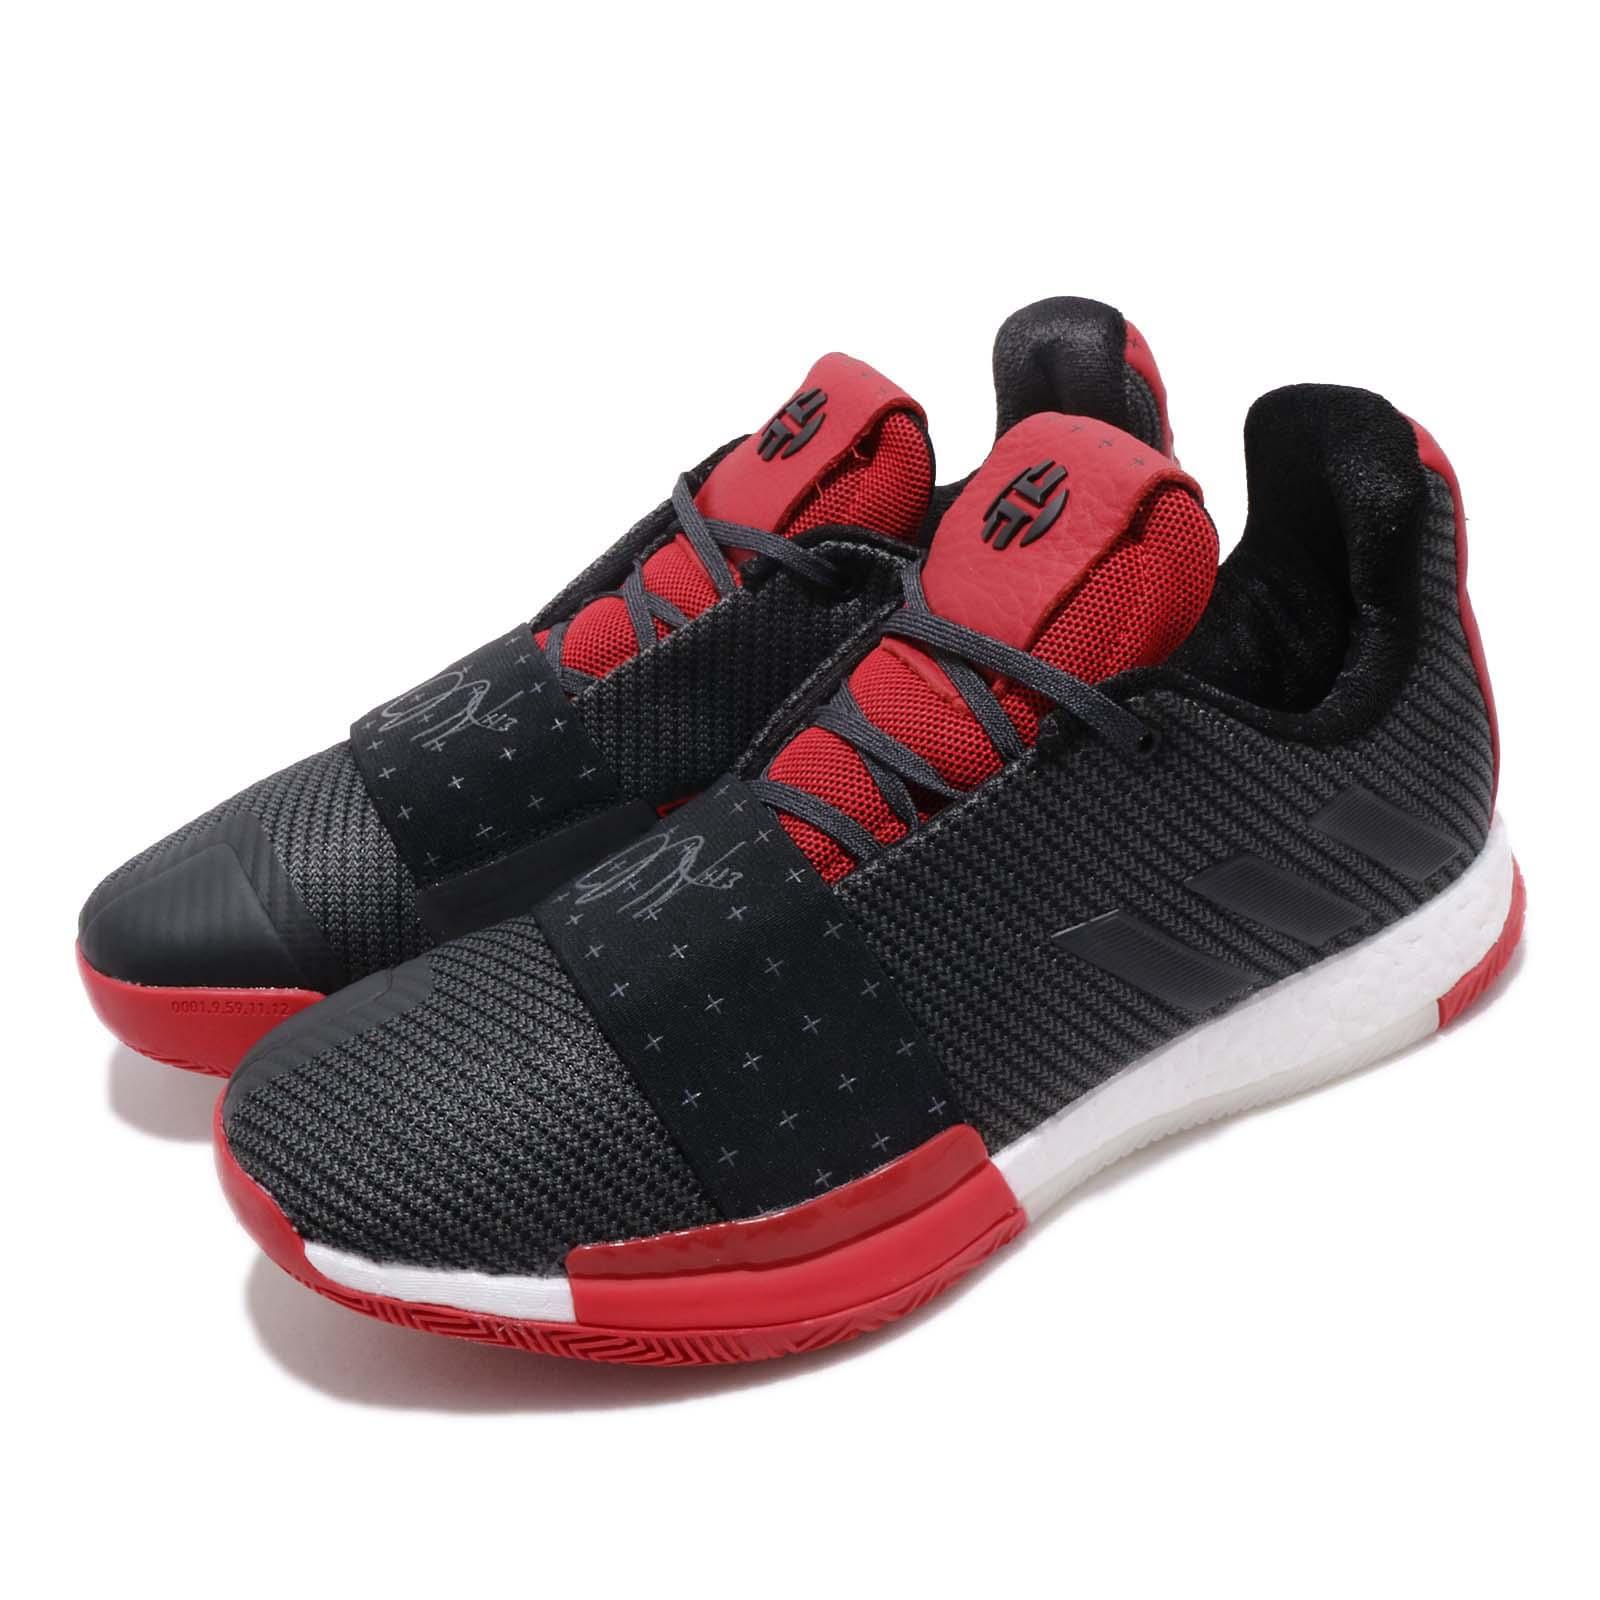 adidas 籃球鞋 Harden Vol. 3 運動 男鞋 AQ0034